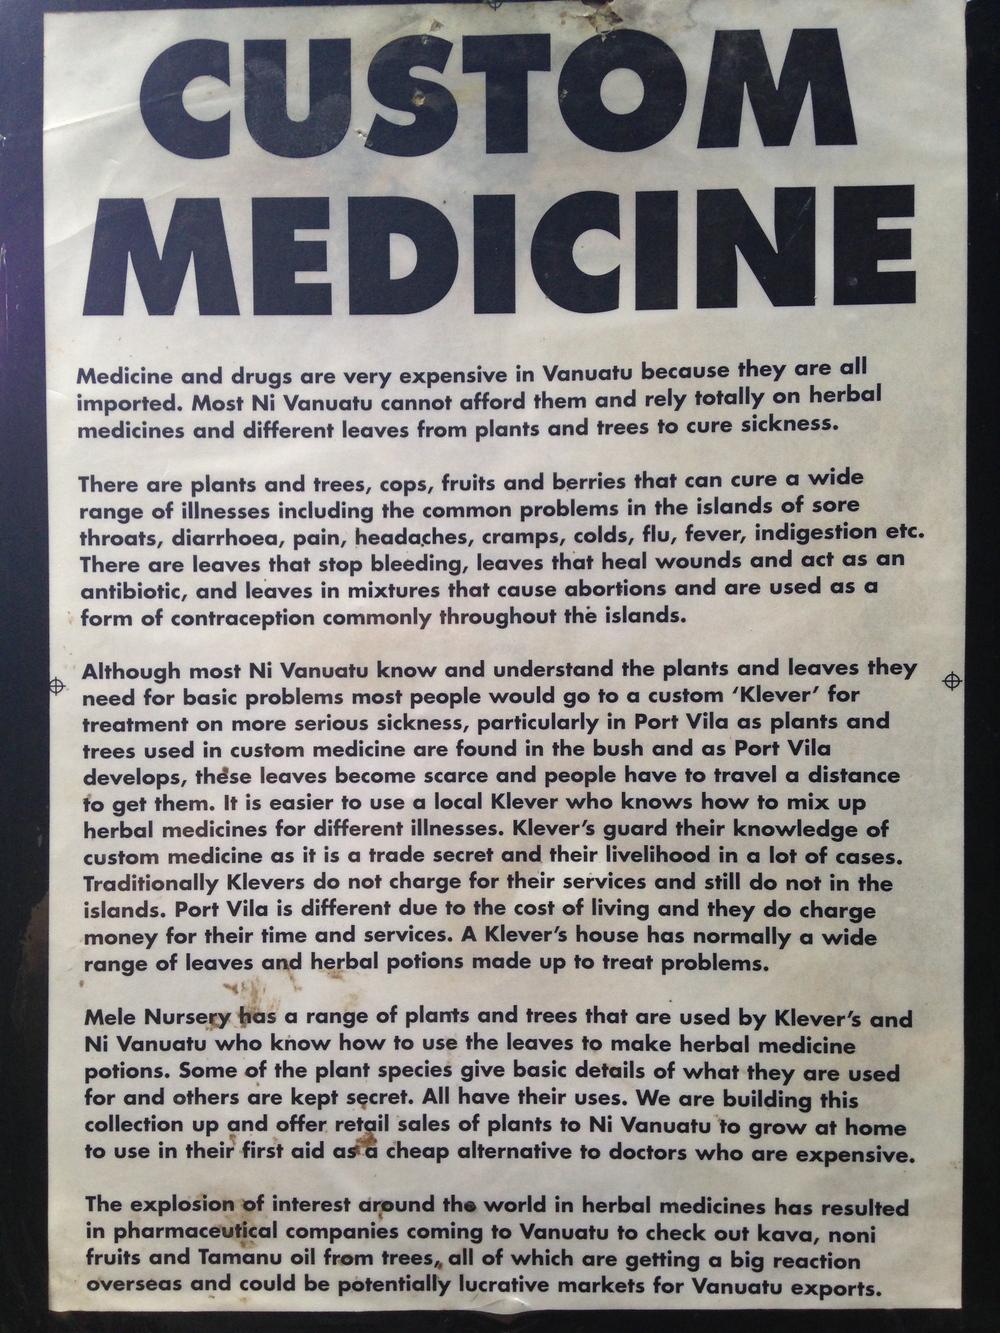 kastommedicine.jpg